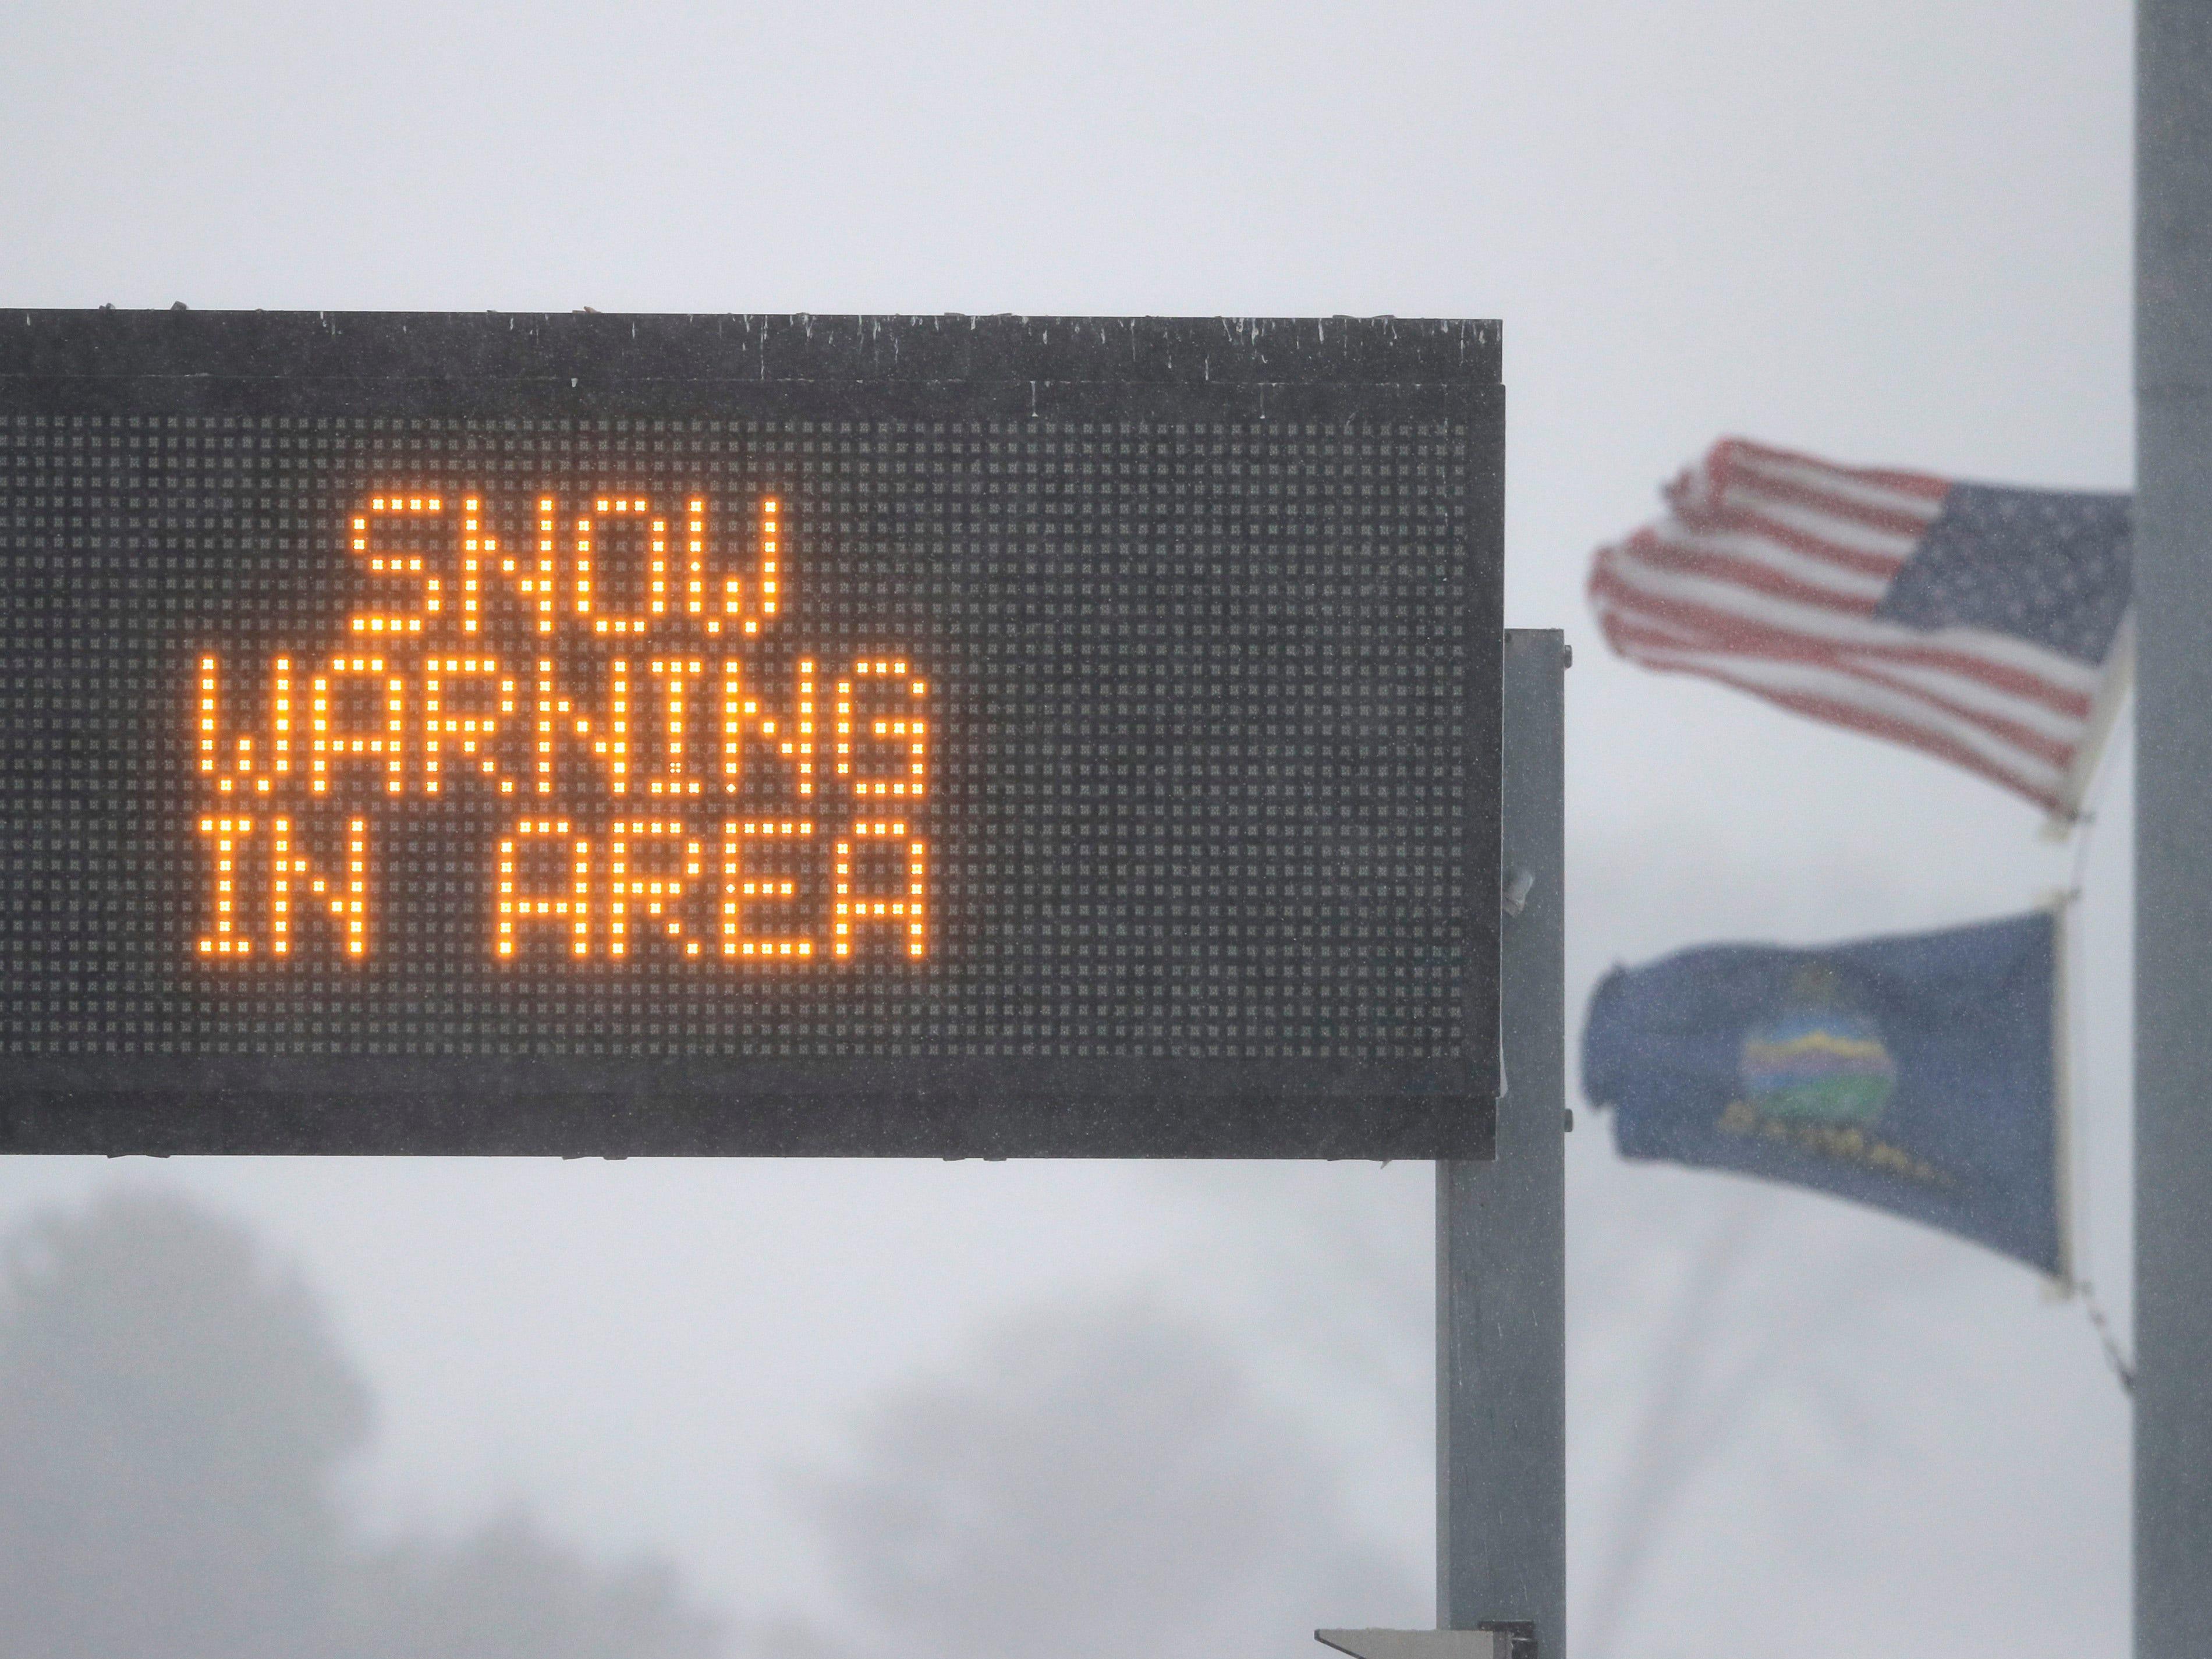 A snow warning sign marks an entrance to the Kansas Turnpike near Lawrence, Kan., Sunday, Nov. 25, 2018.